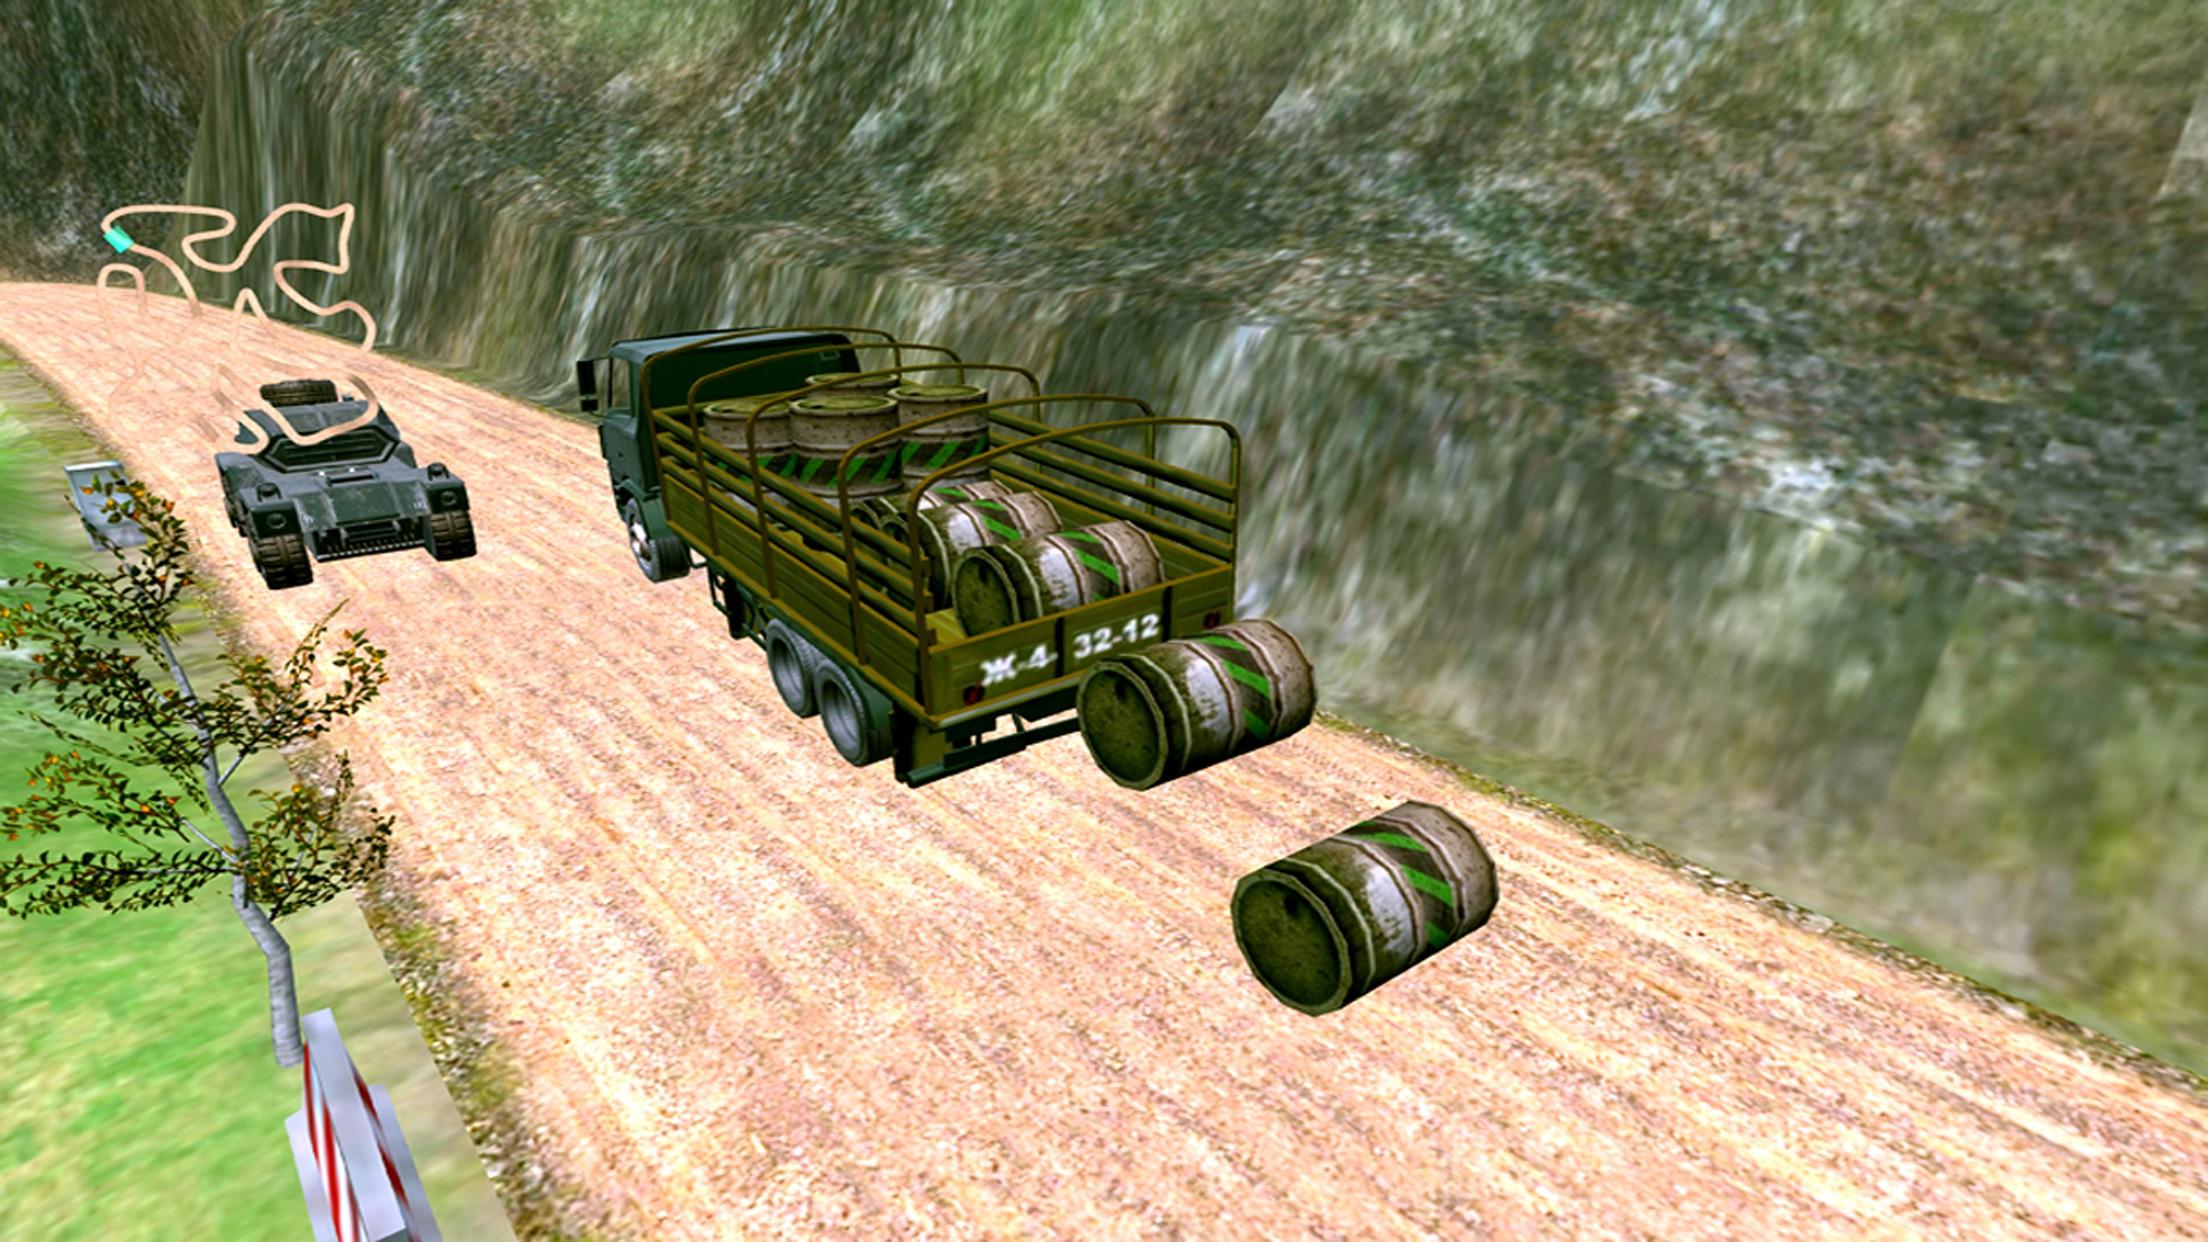 US Army Mission Cargo